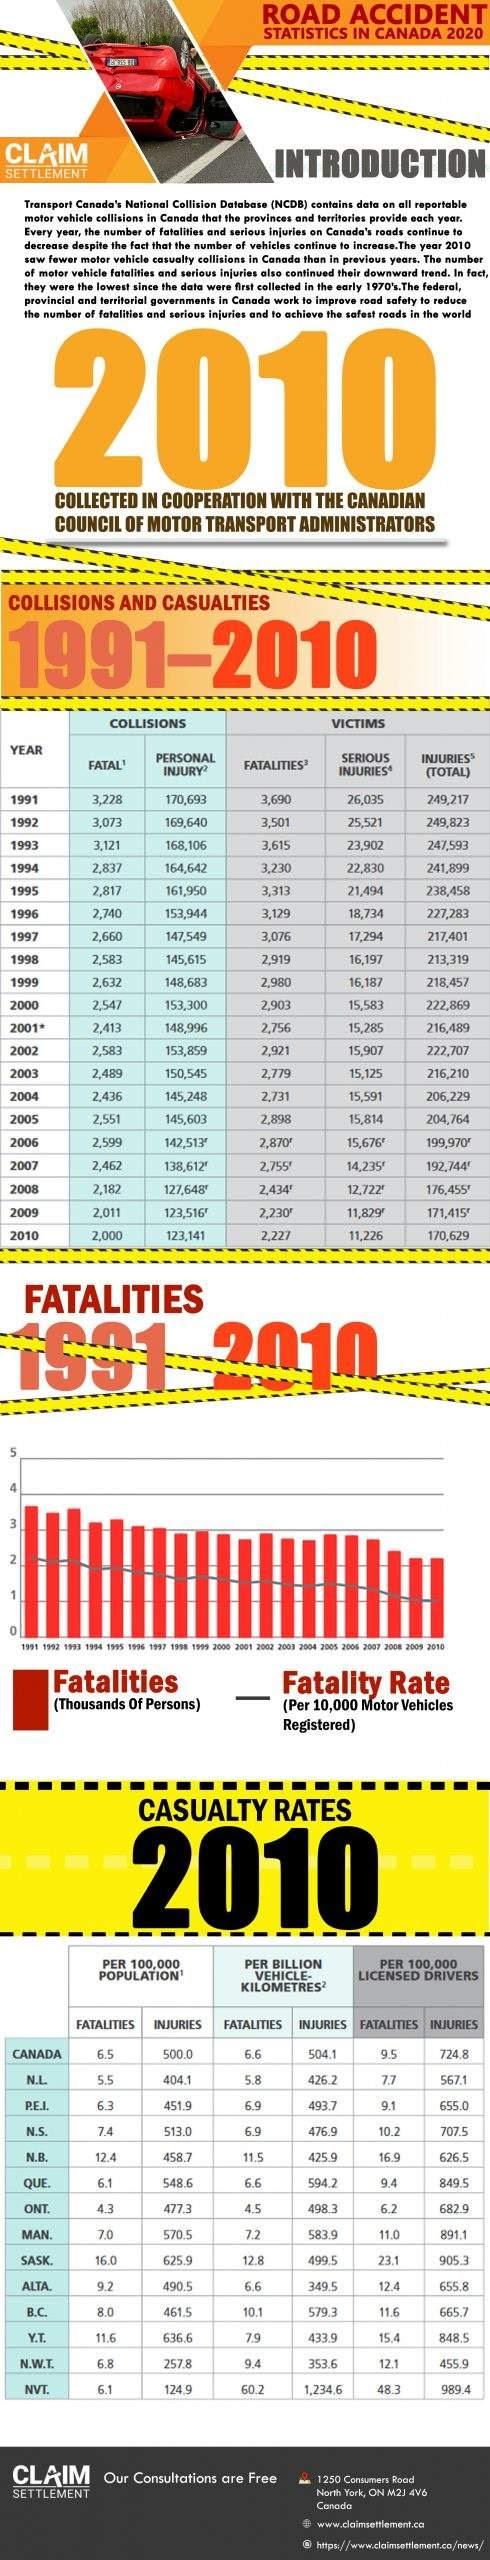 Car Accident Statistics in Canada #infographic